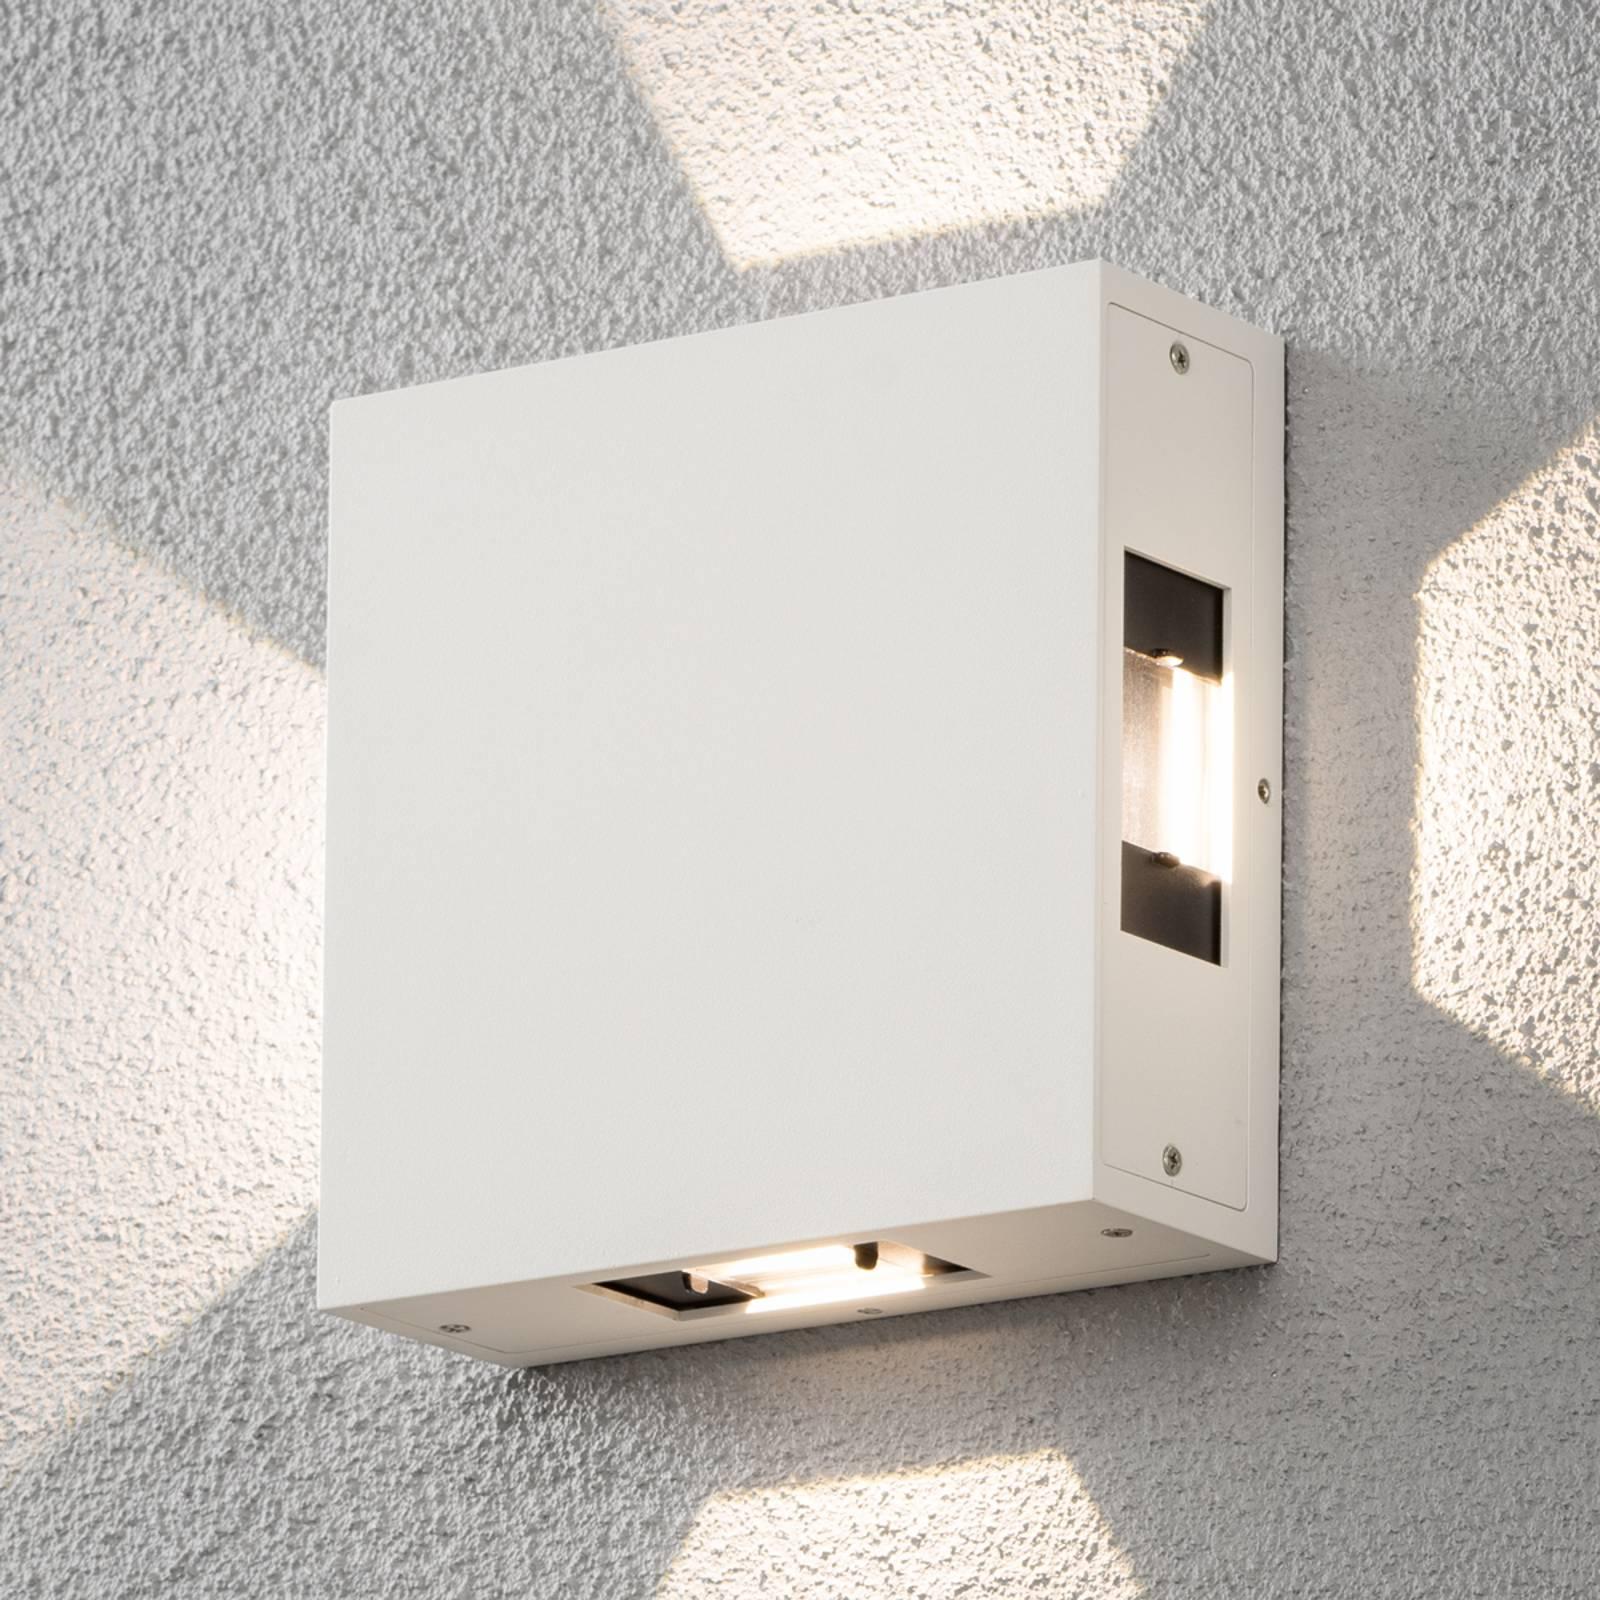 Cremona - Led buitenwandlamp, verstelbaar, wit